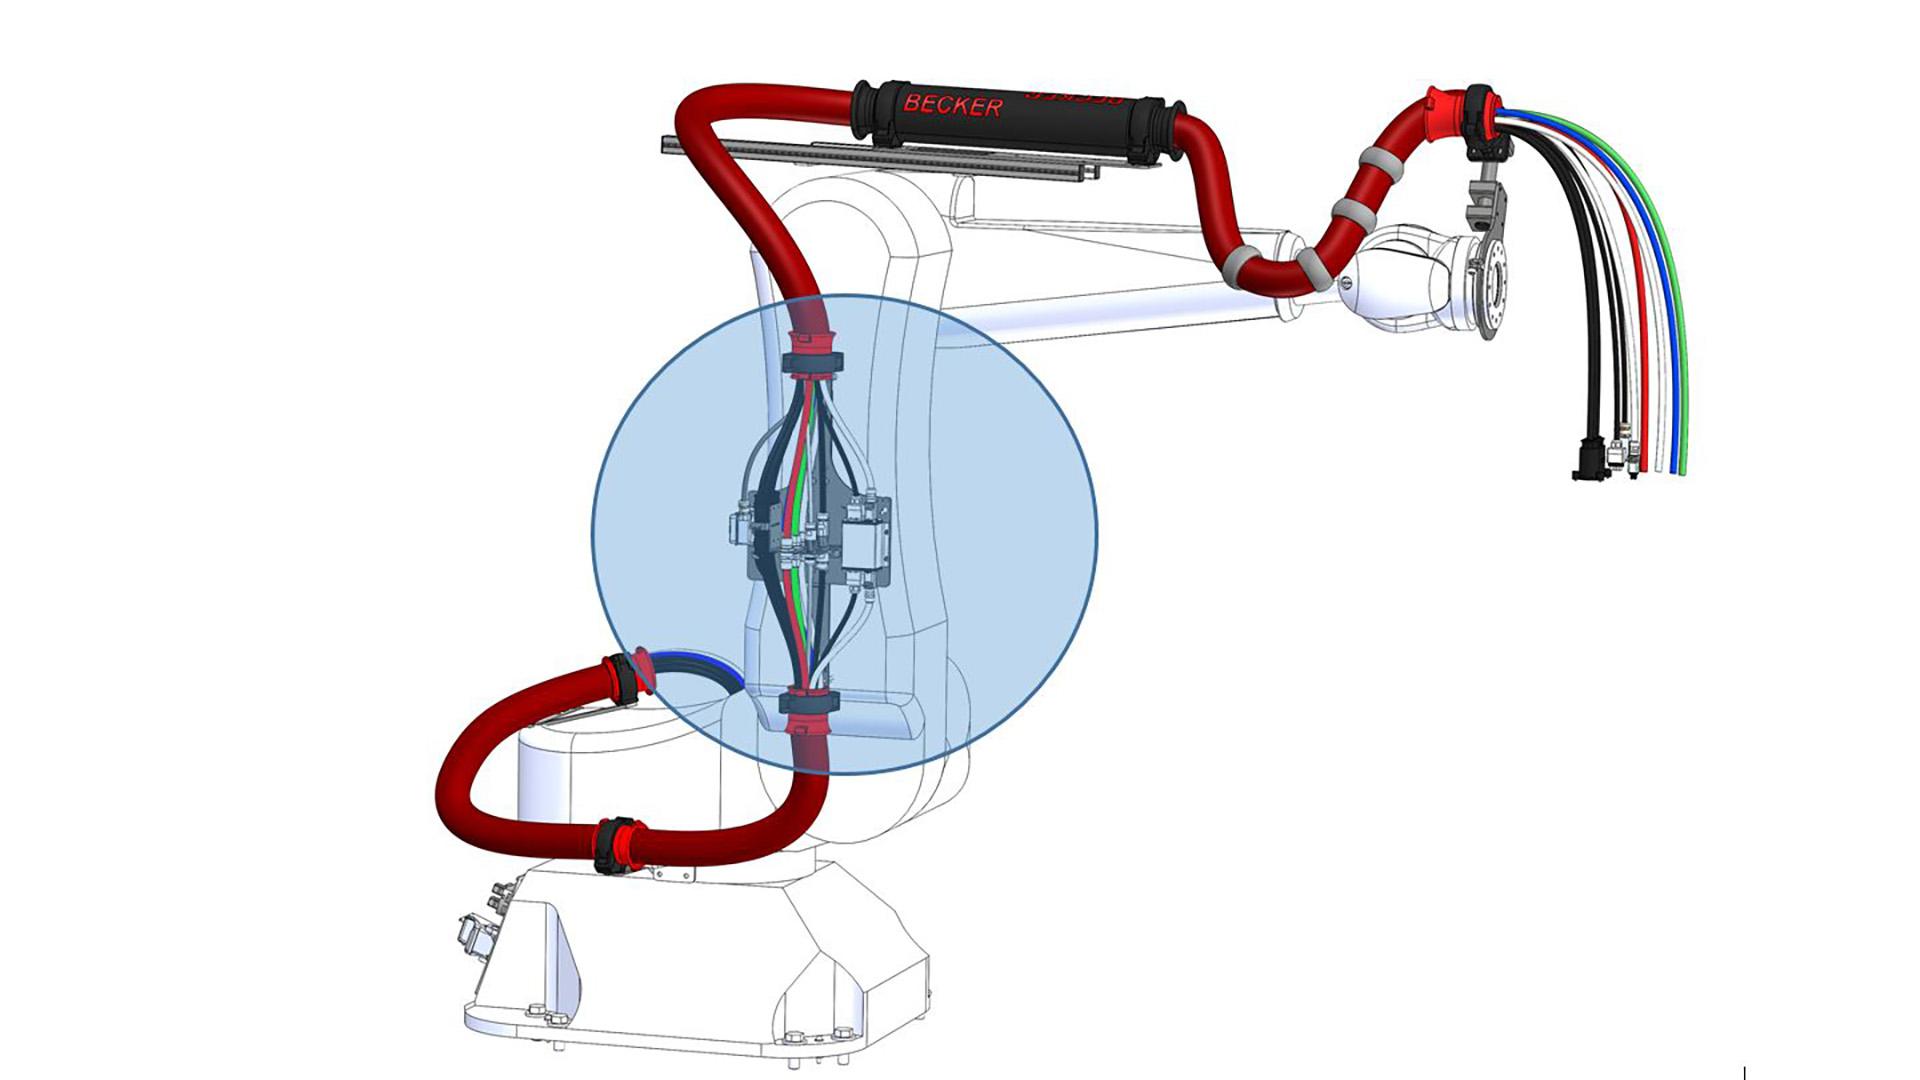 Energy Supply Systems / Becker Robotic Equipment